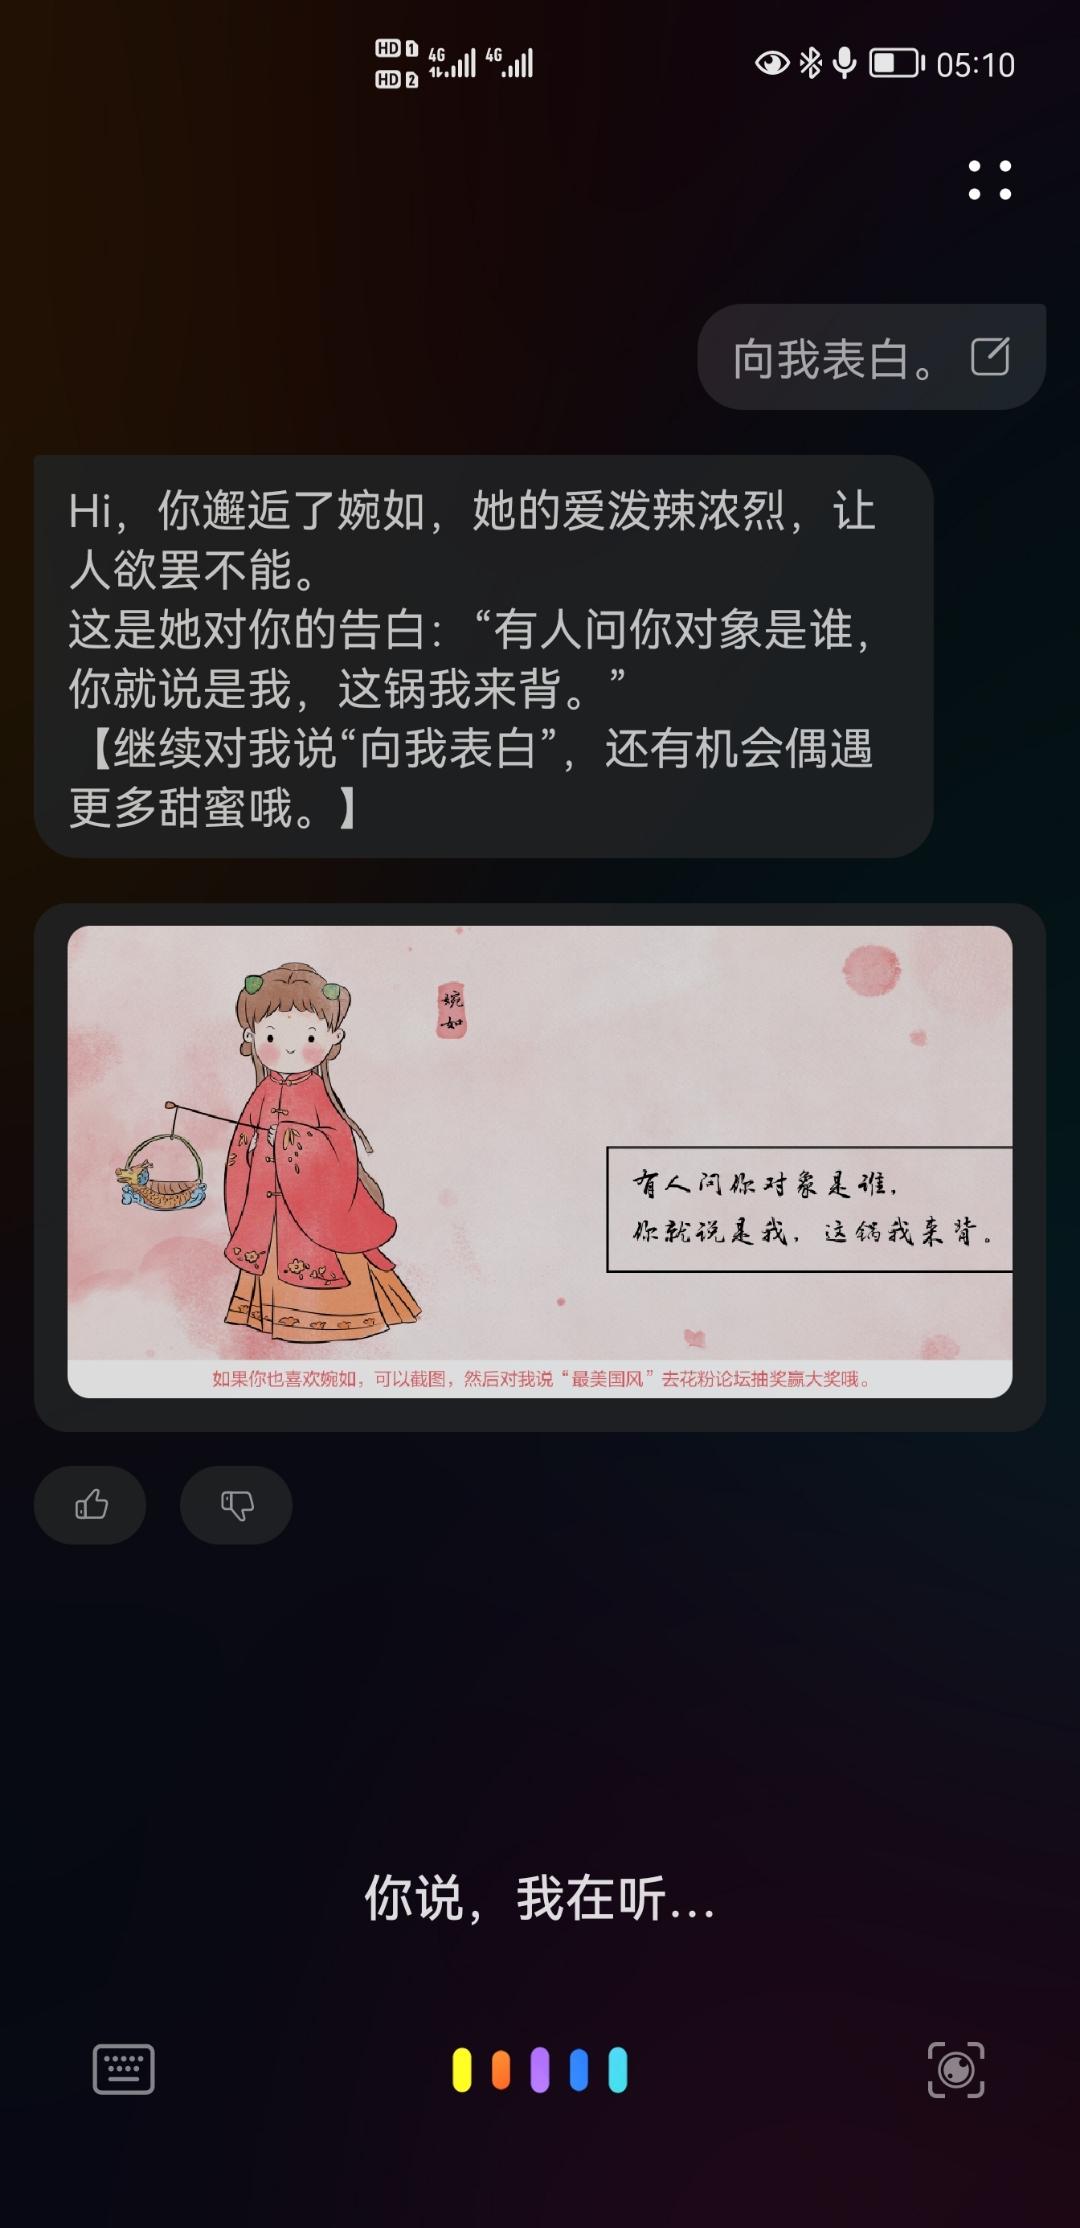 Screenshot_20210612_051016_com.huawei.vassistant.jpg